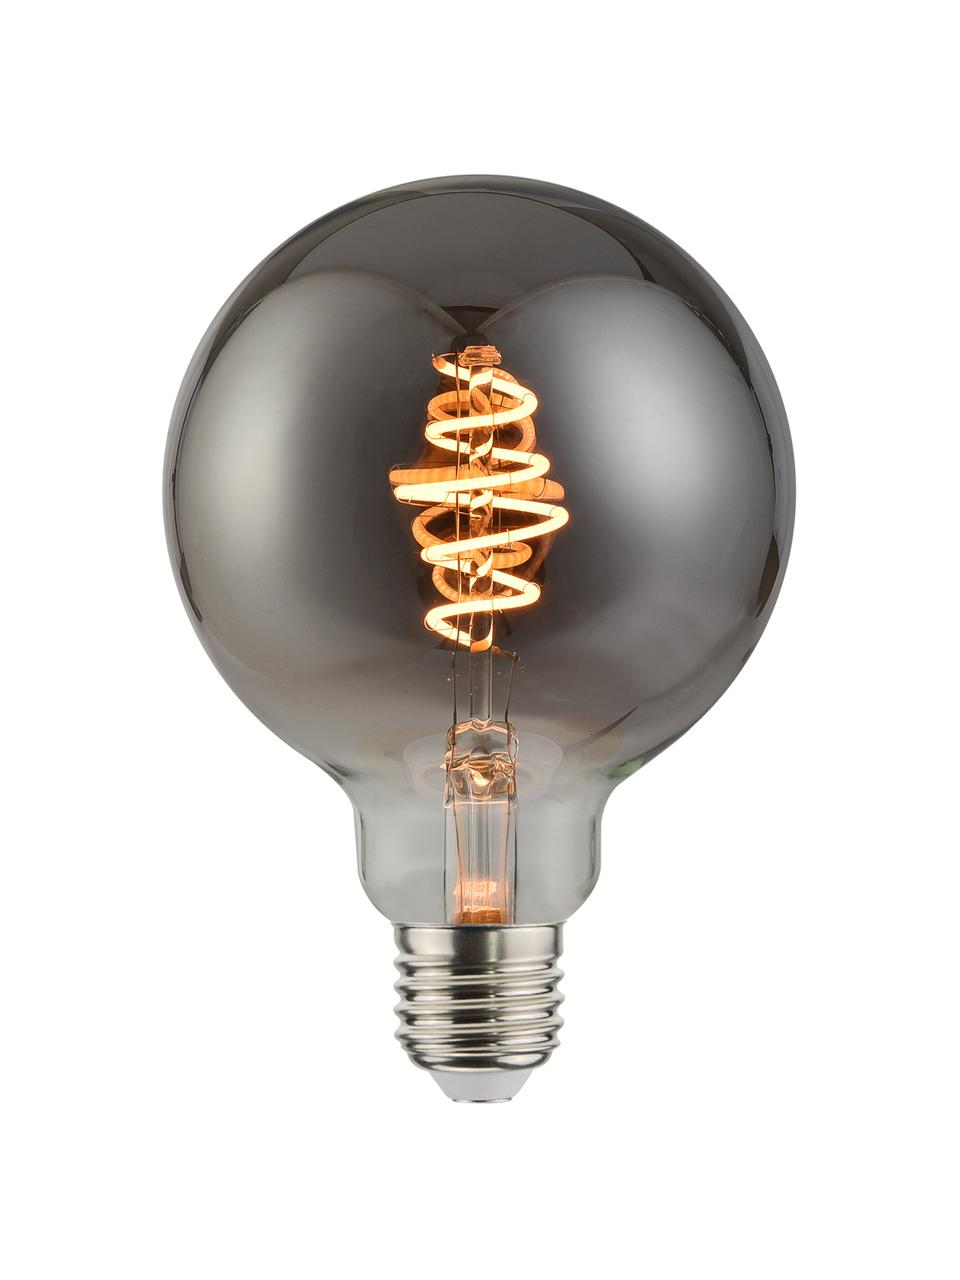 Lampadina E27, 140lm, dimmerabile, bianco caldo, 1 pz, Paralume: vetro, Base lampadina: metallo, Grigio trasparente, Ø 10 x Alt. 14 cm